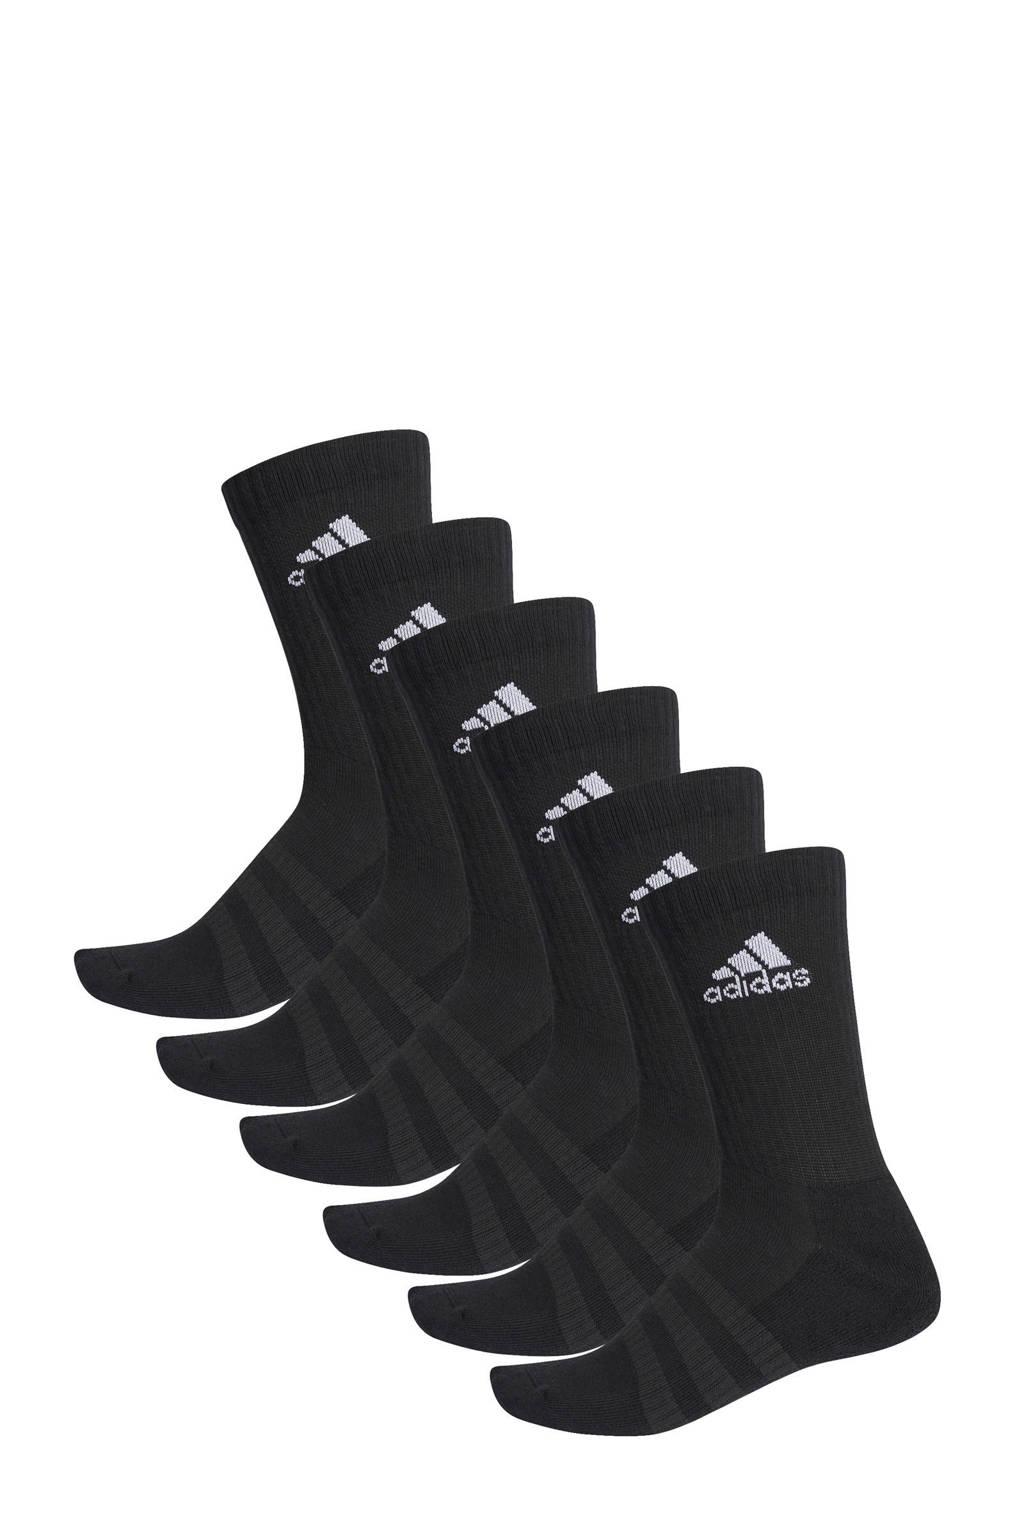 adidas Performance   sportsokken - set van 6 zwart, Zwart